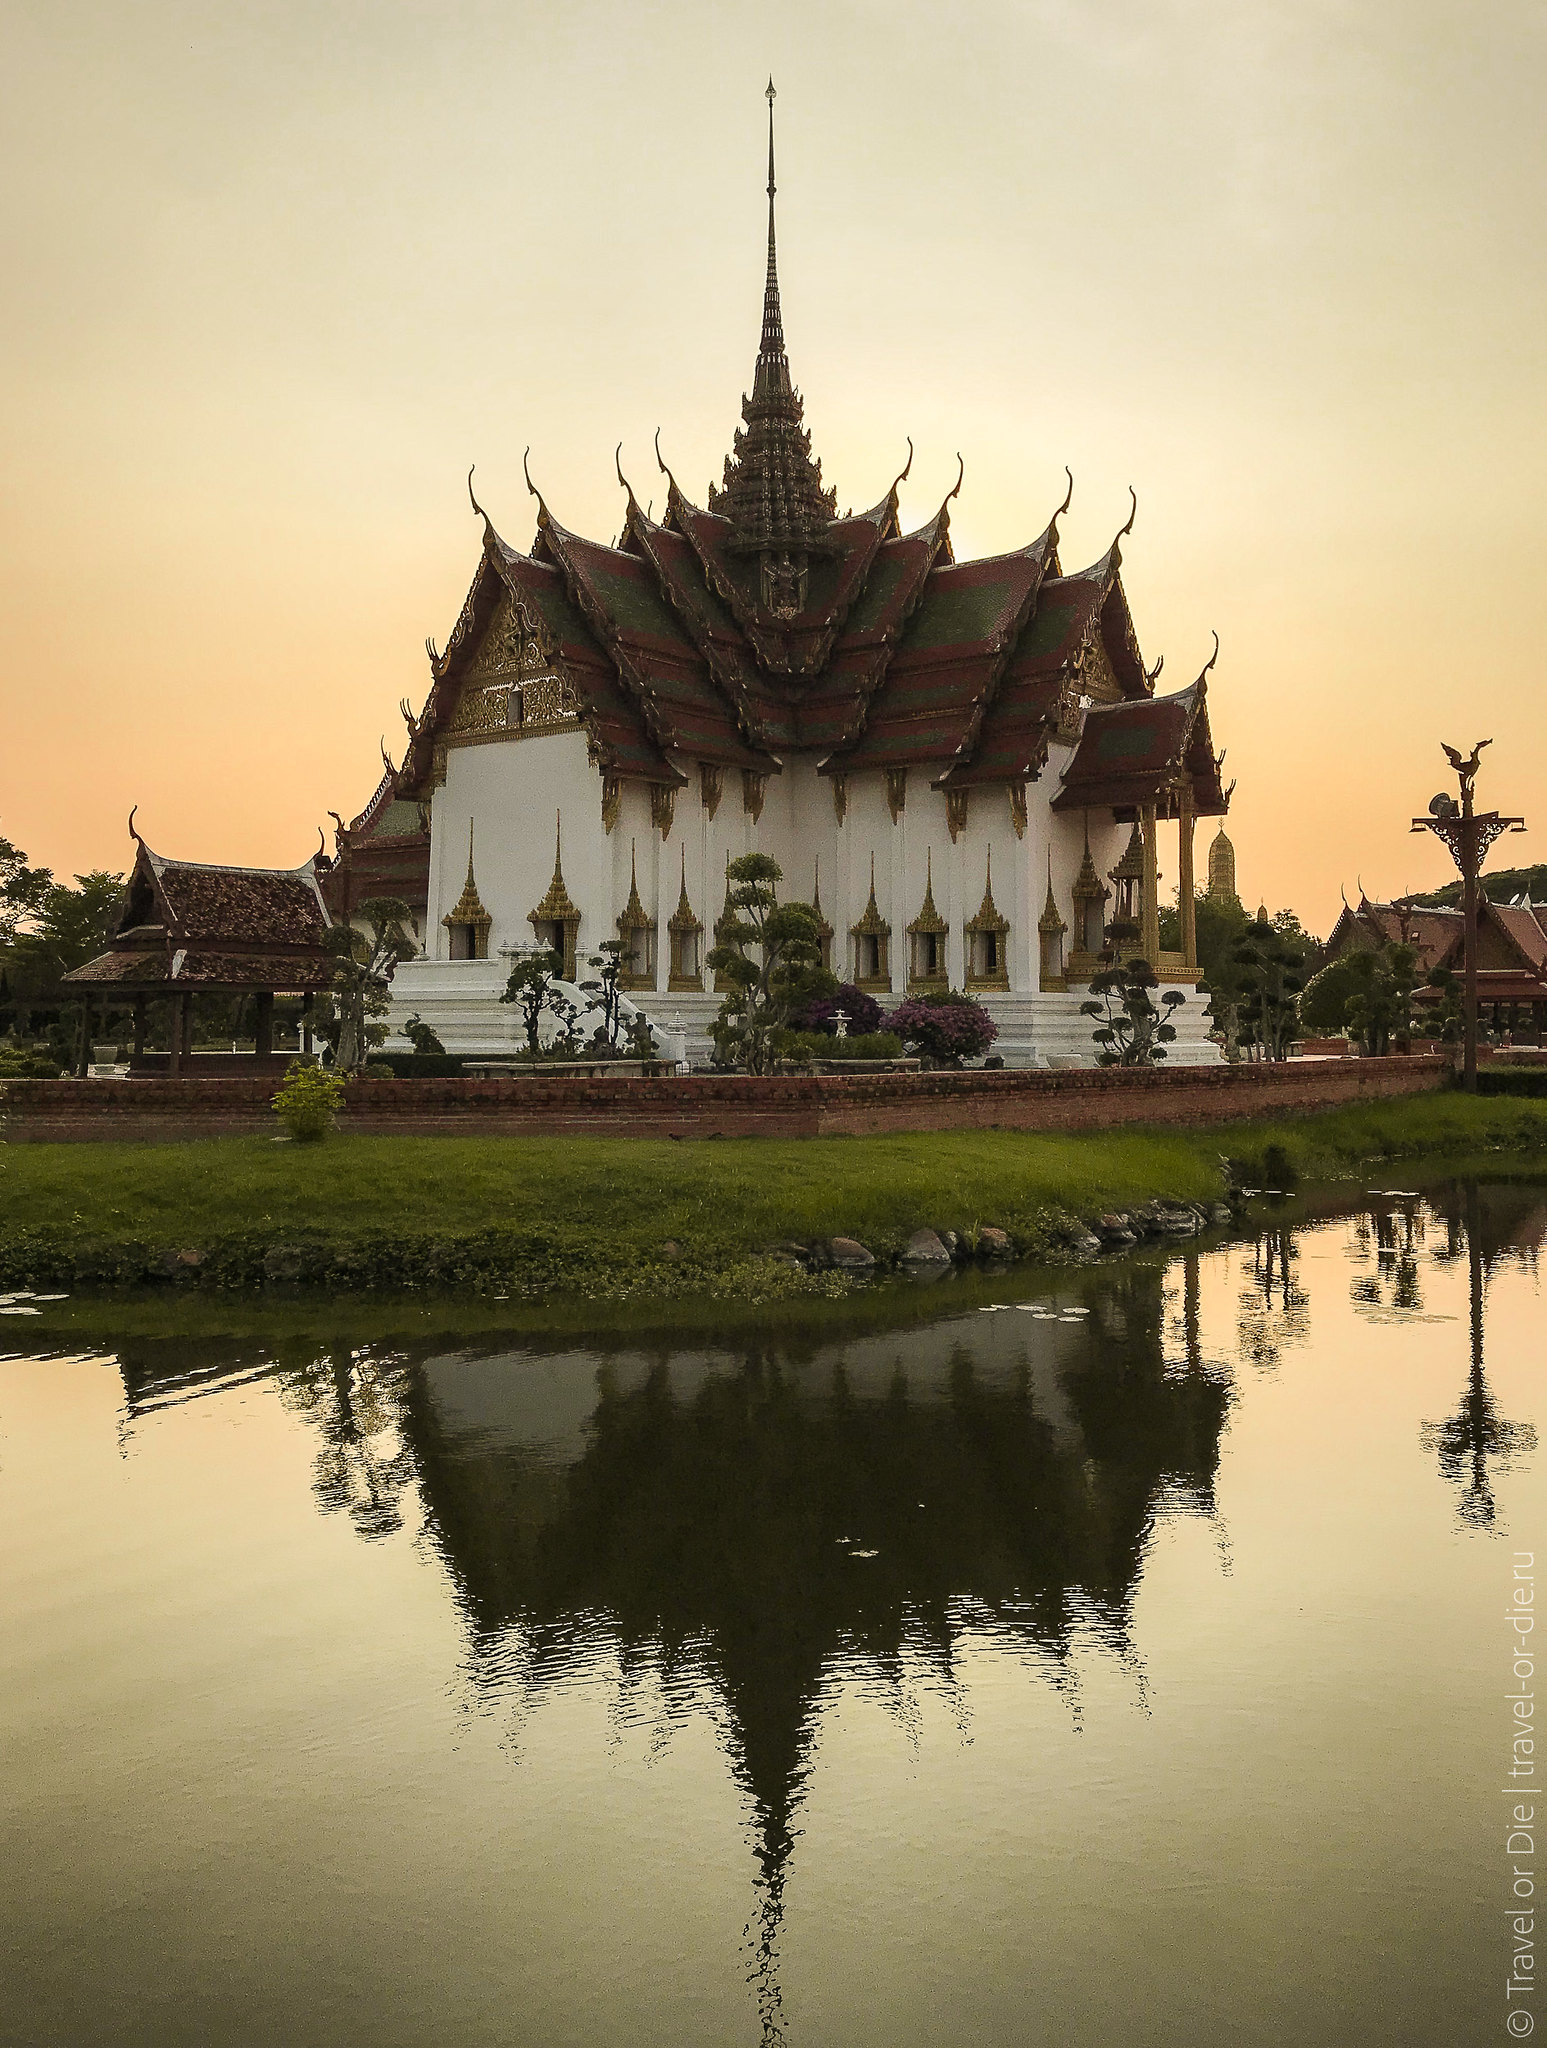 Ancient-City-Muang-Boran-Bangkok-9805